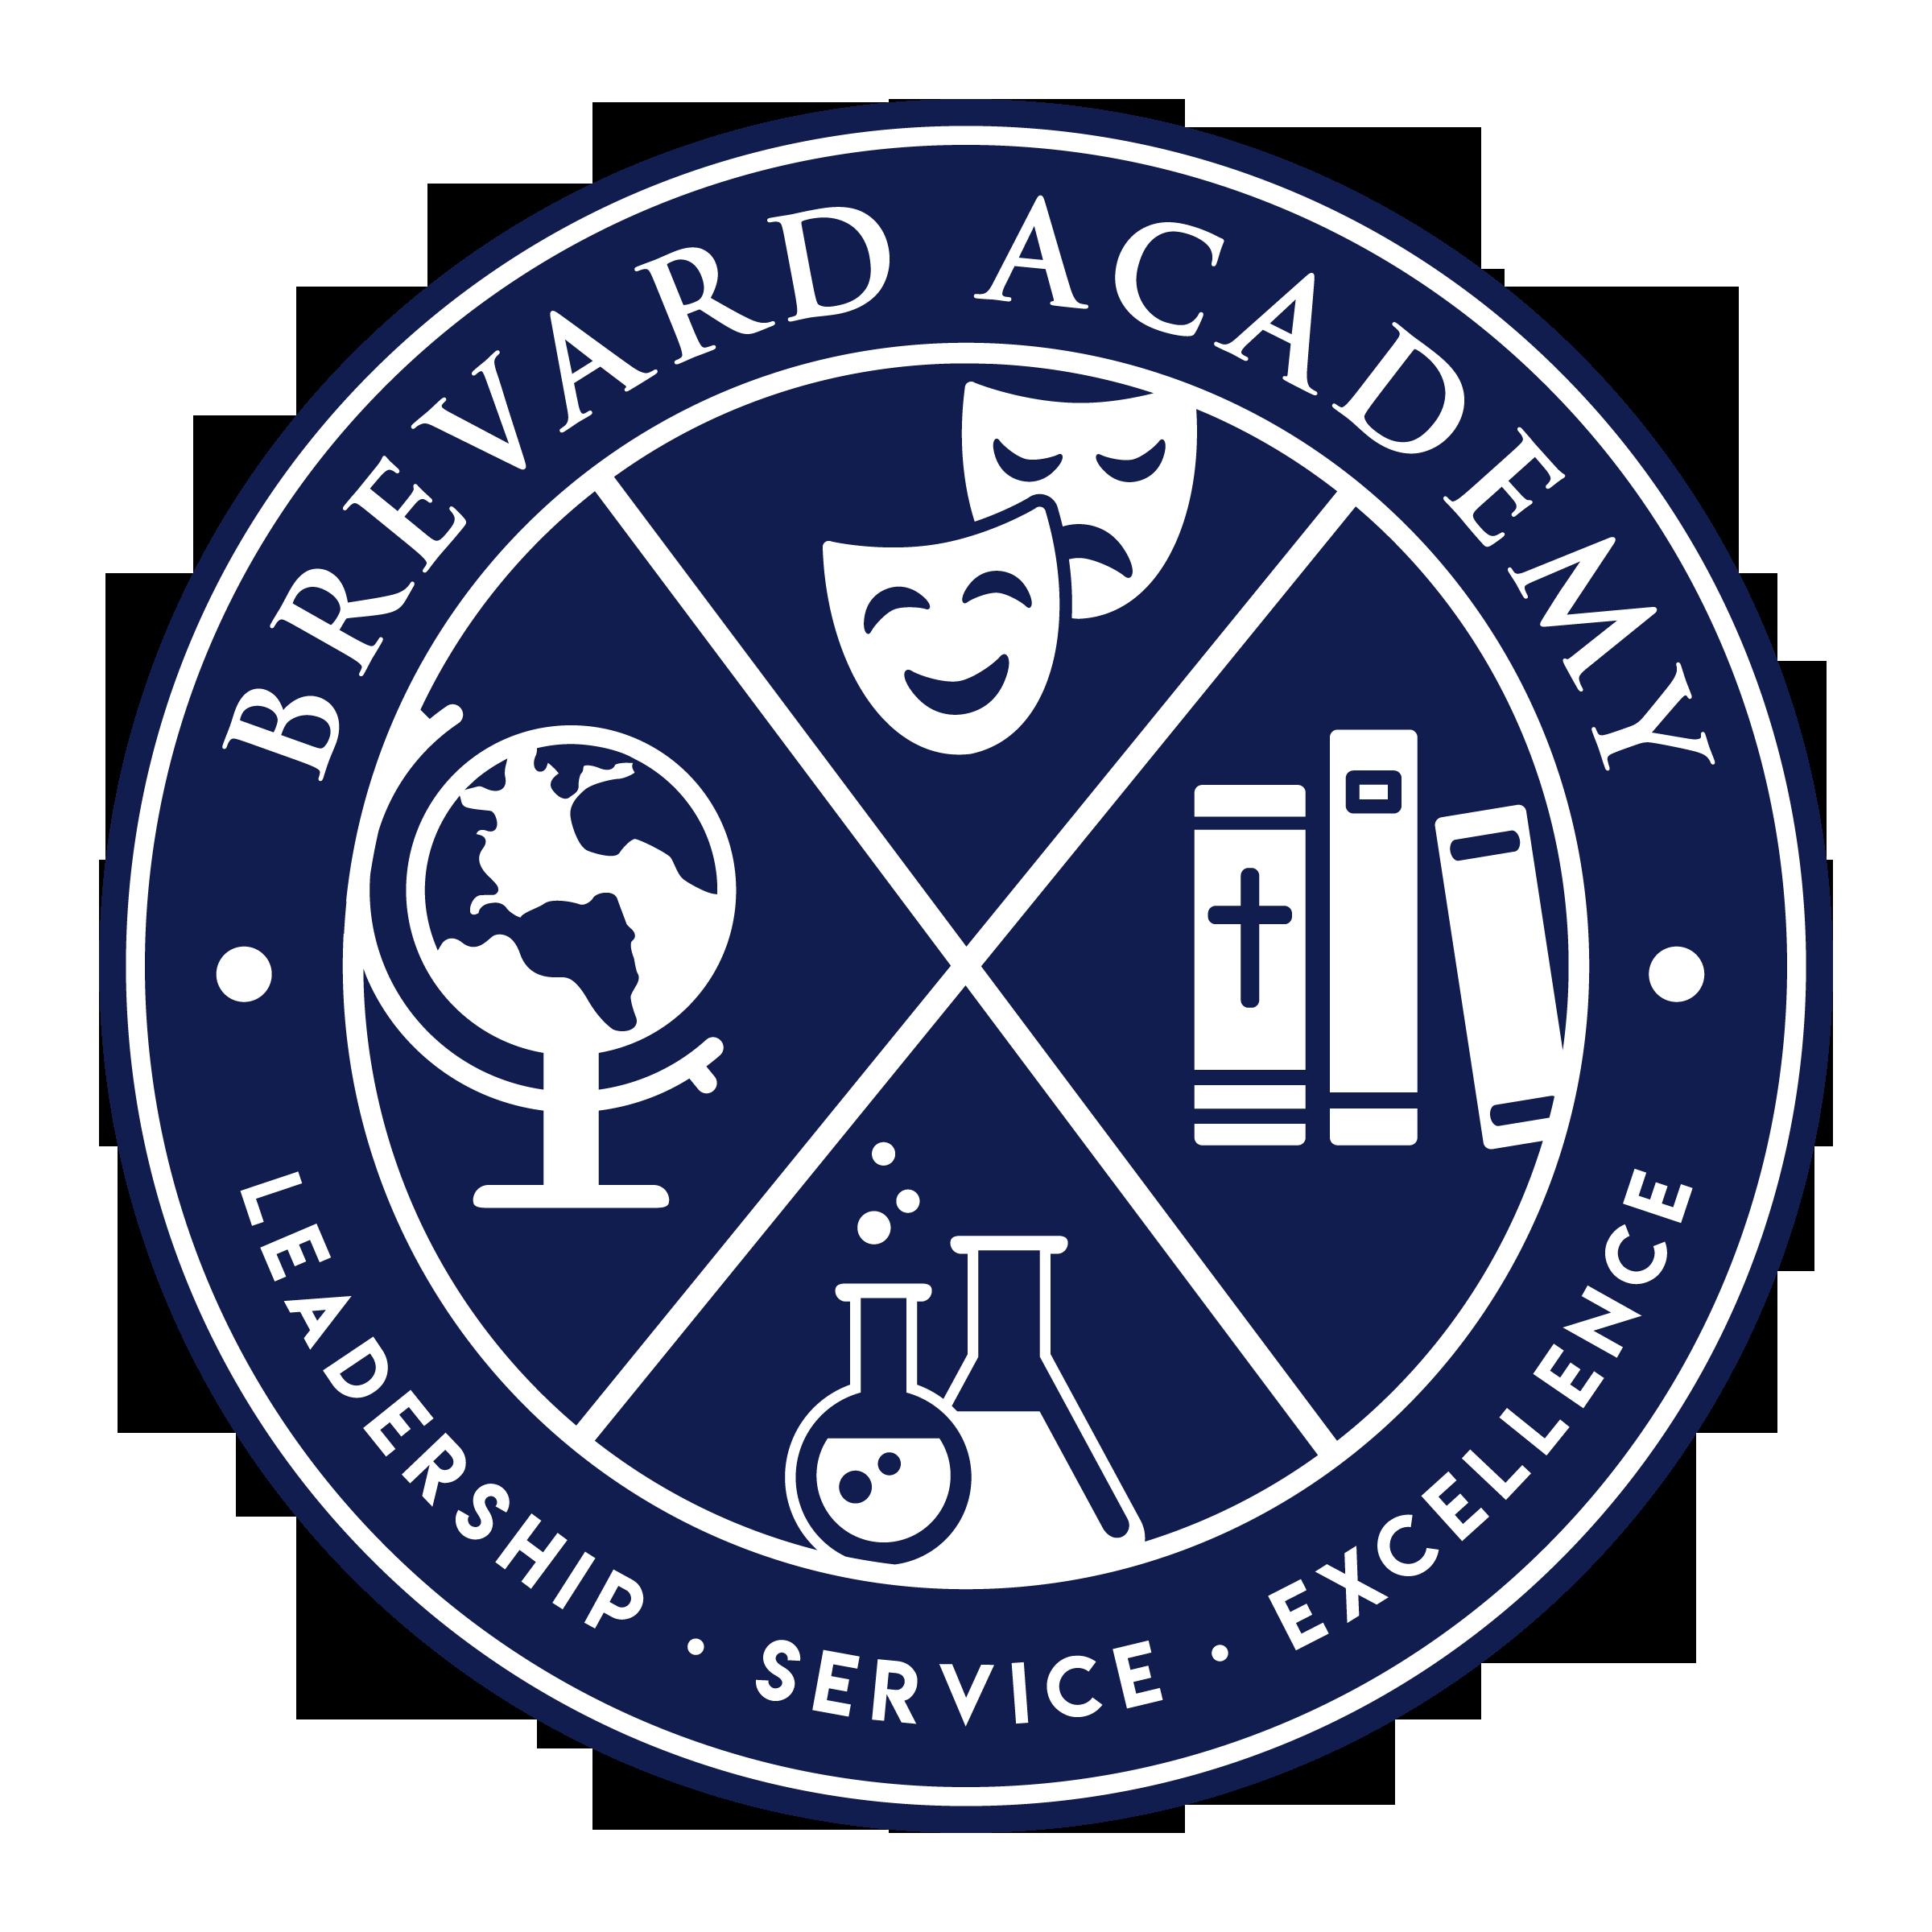 Brevard Academy